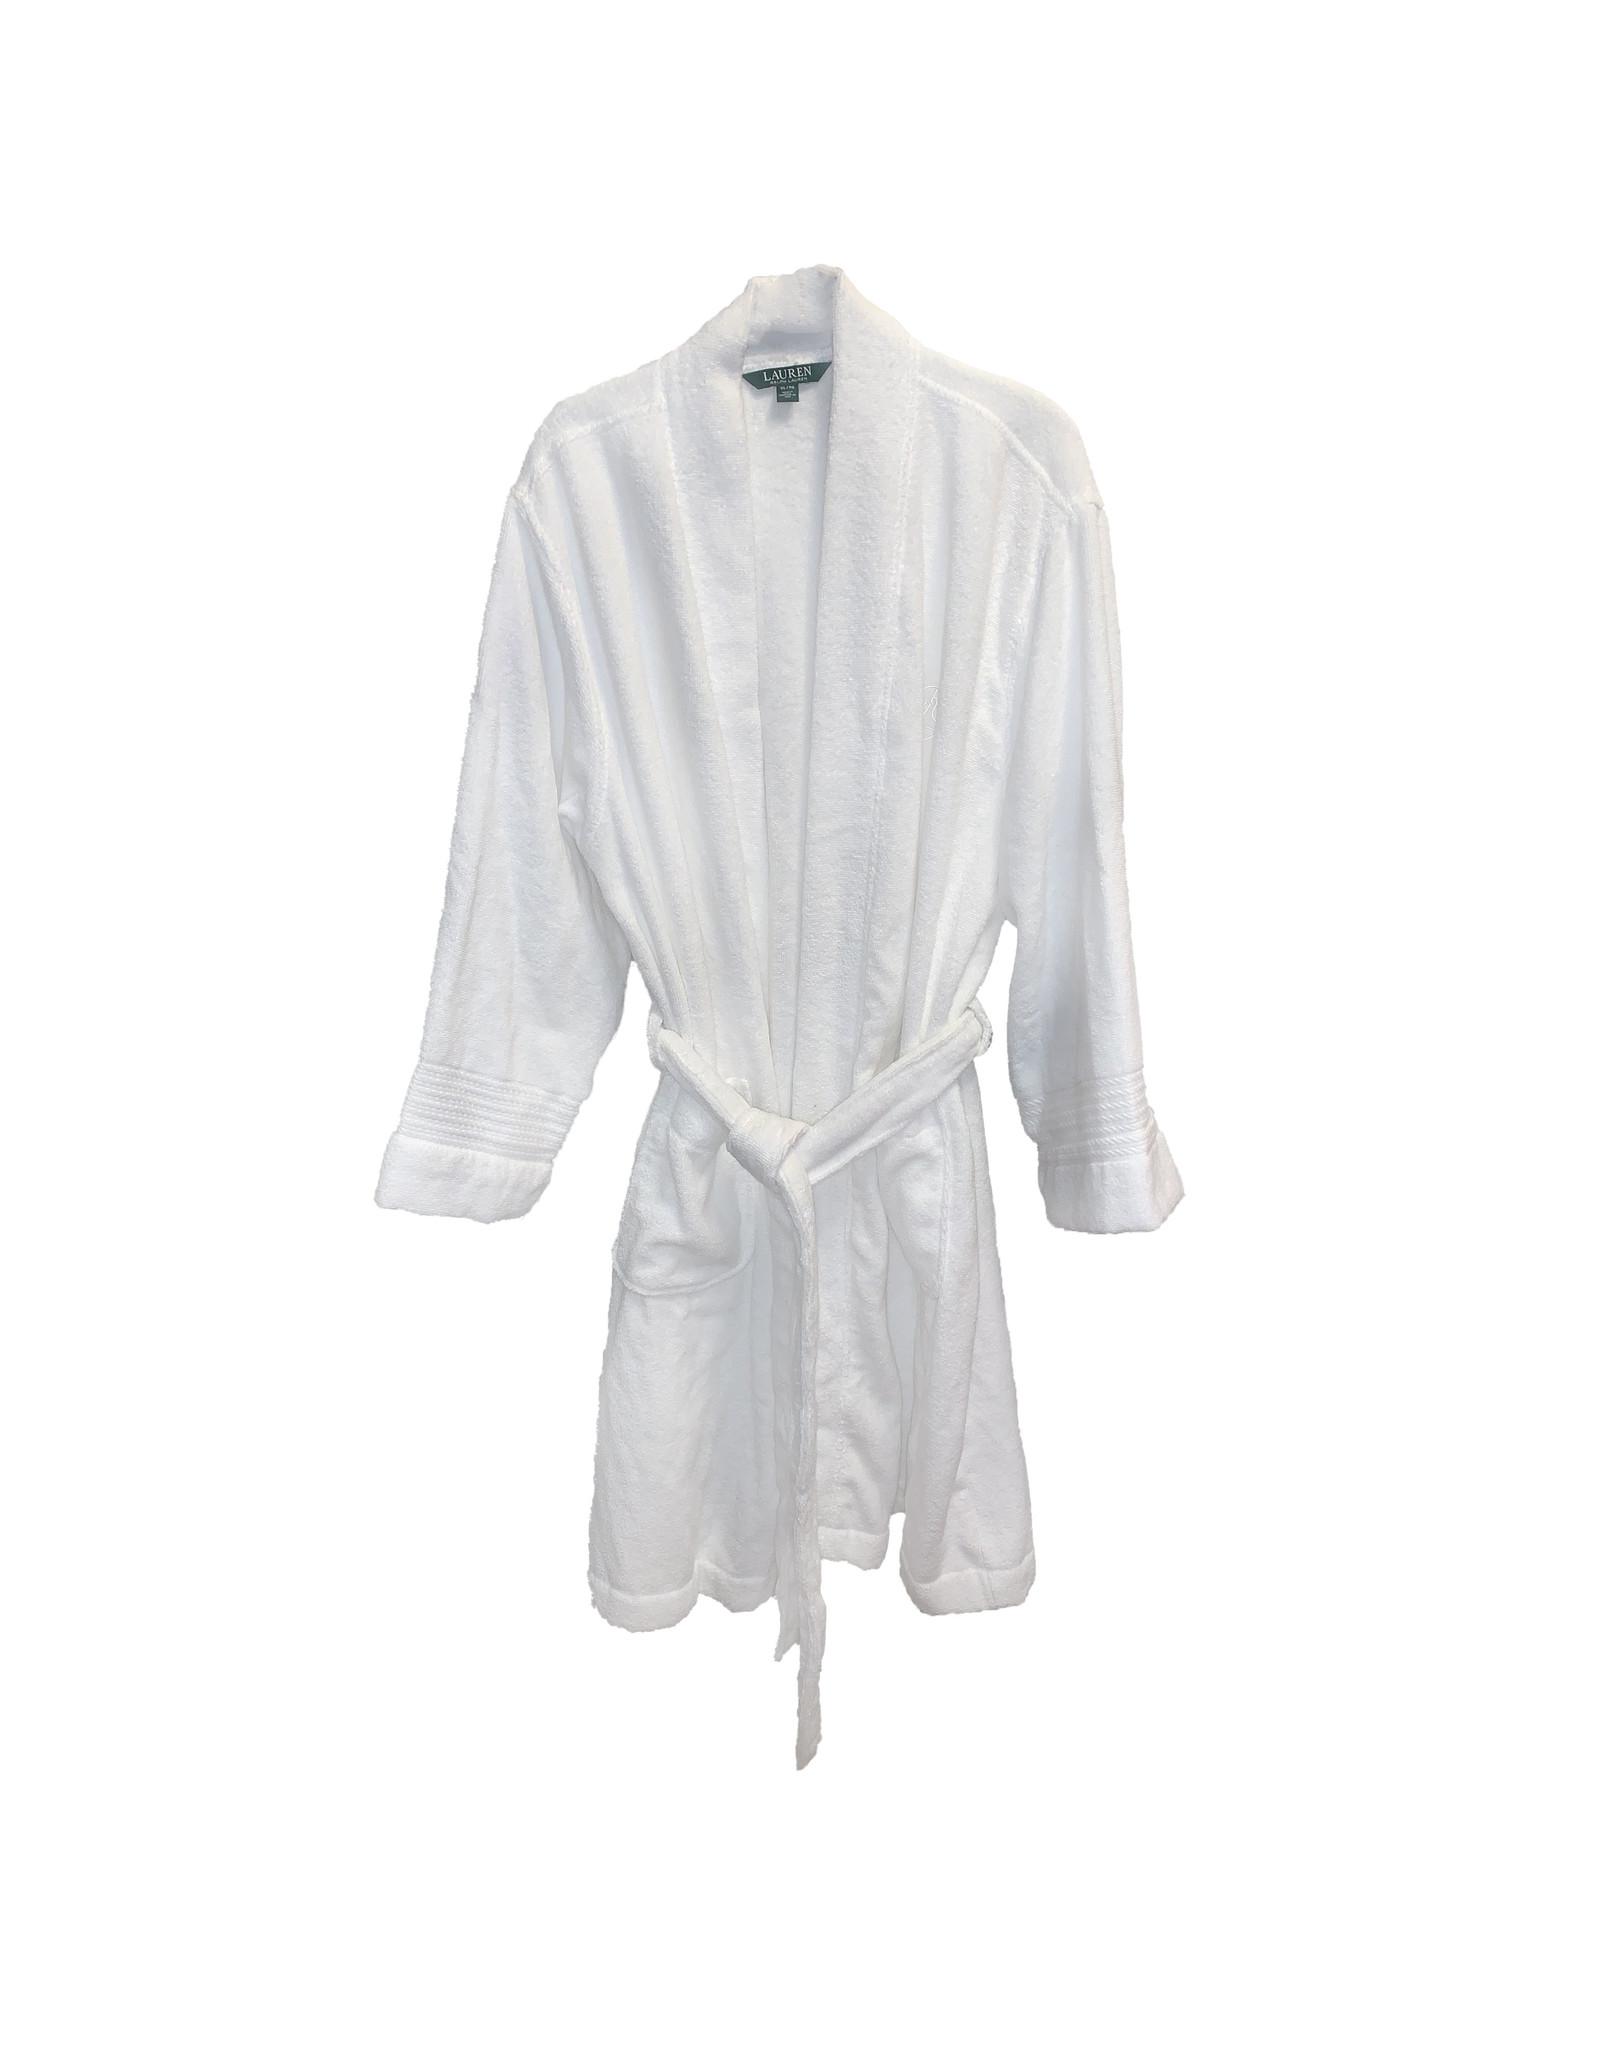 LAUREN RALPH LAUREN Lauren Ralph Lauren  Greenwich  Terry Robe Size XL